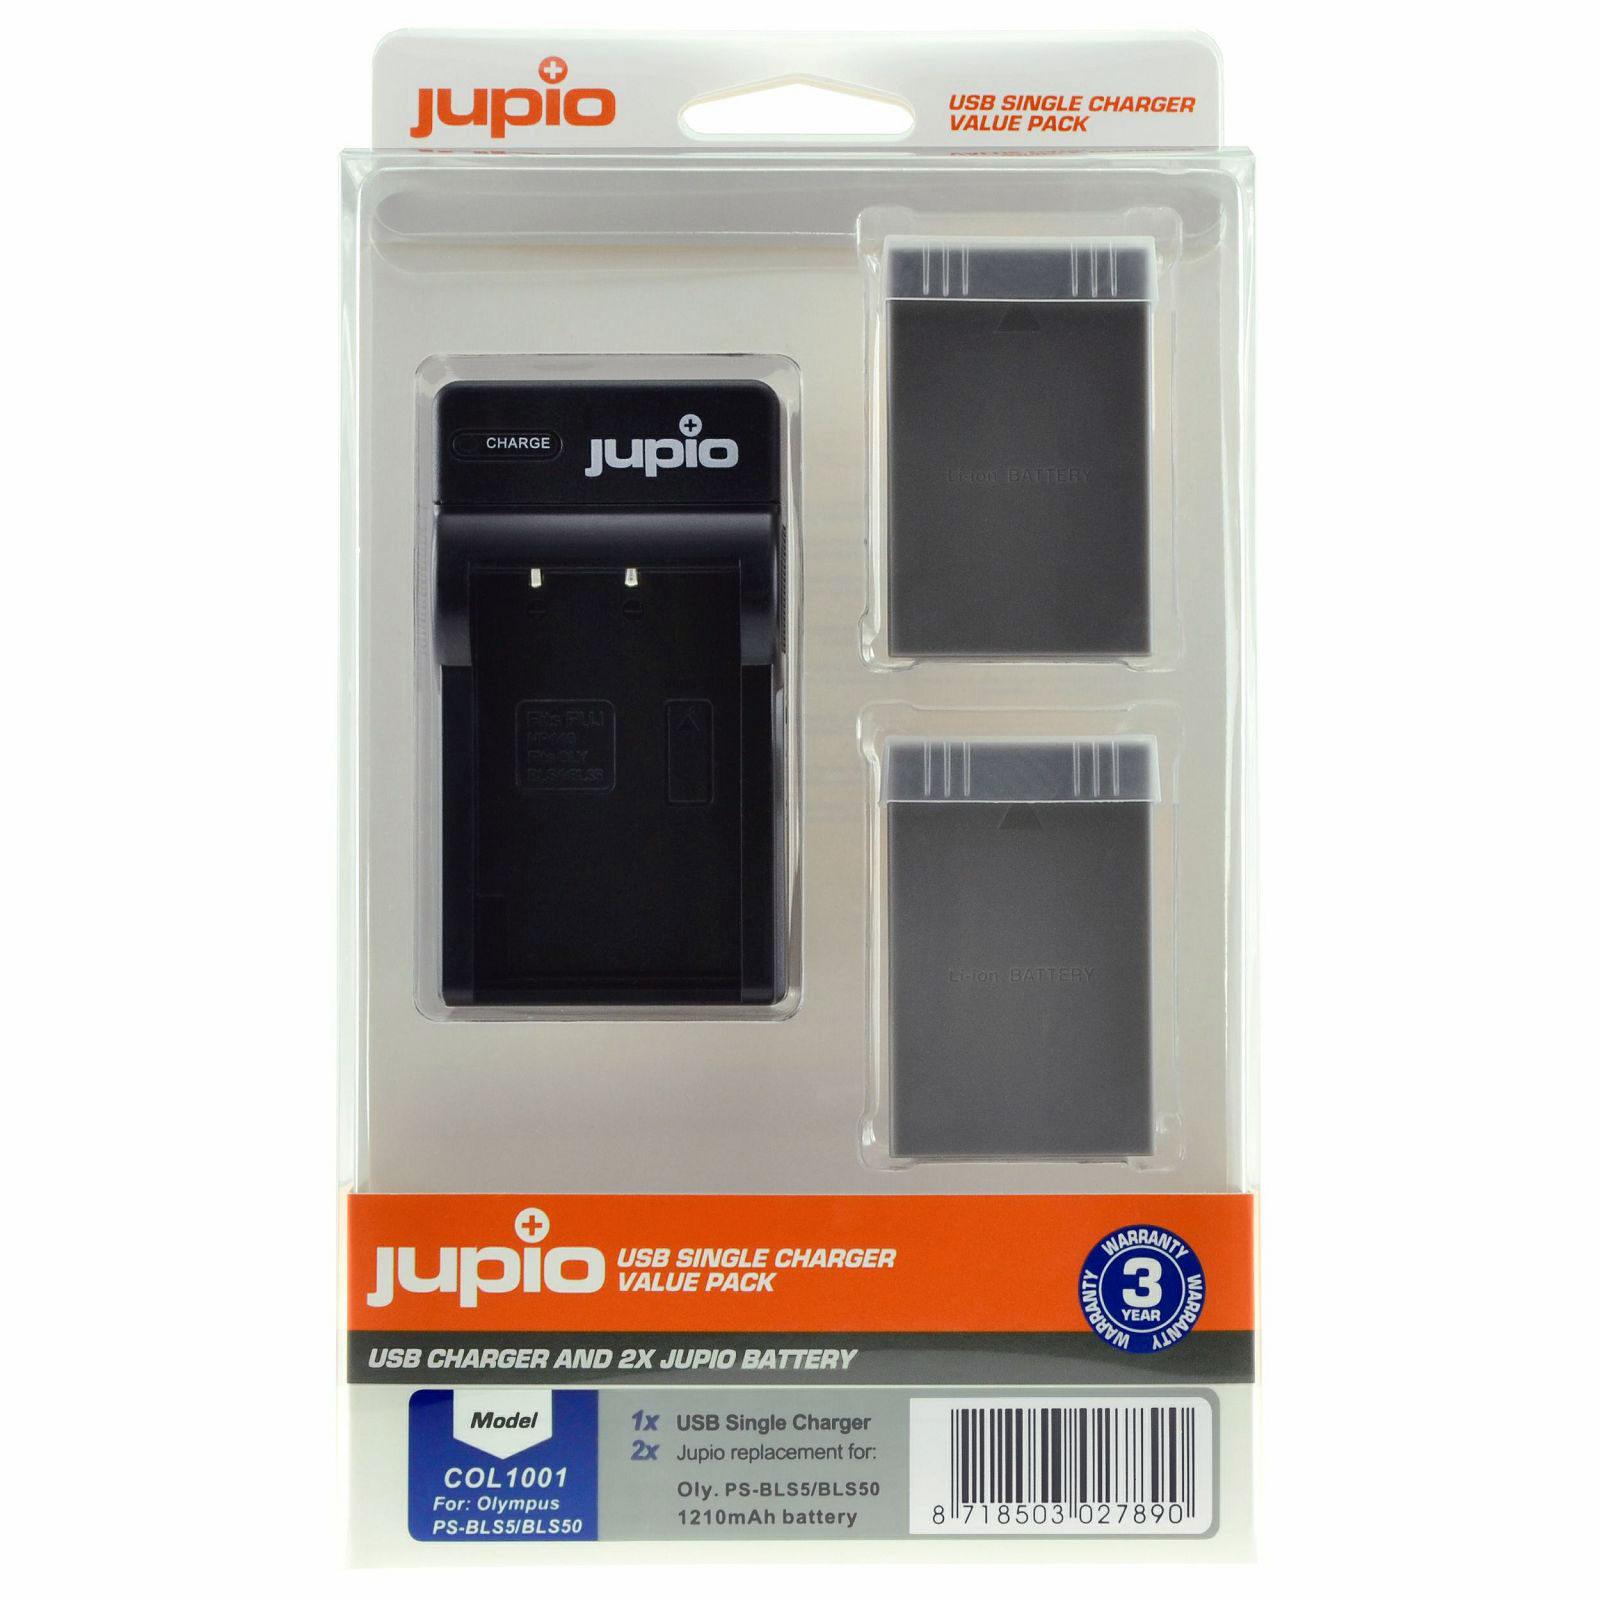 Olympus PS-BLS5/PS-BLS50 USB Single Charger Kit (Merk Jupio)